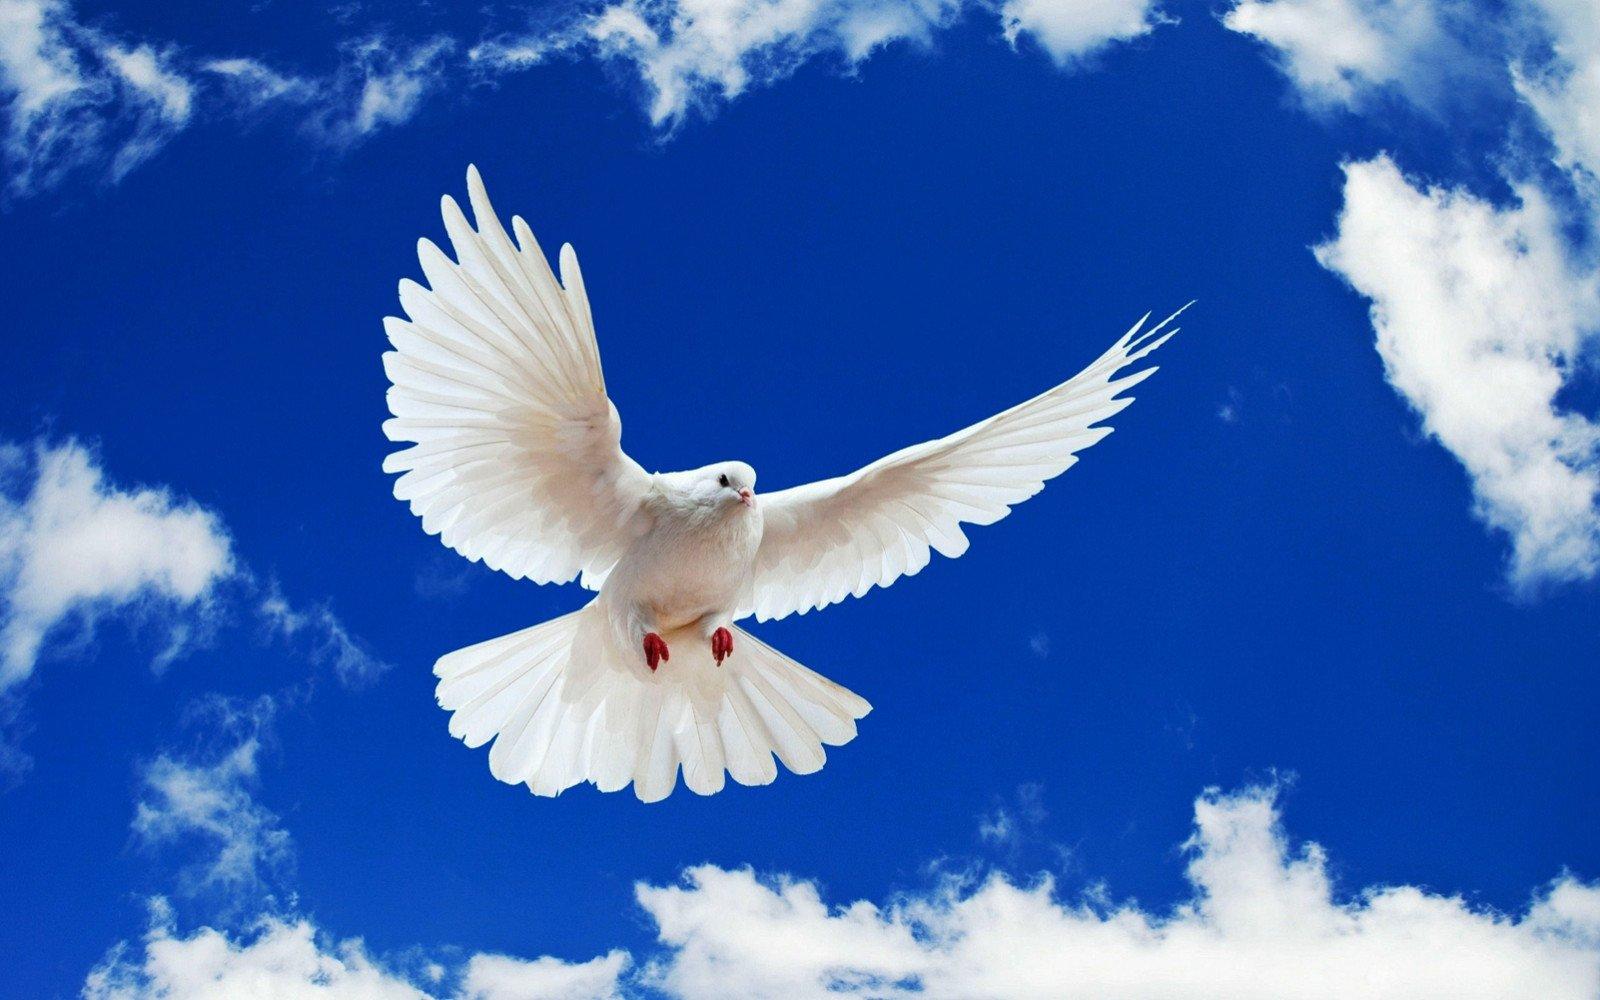 CHOIS Custom Films CF3339 Animal Flying Pigeons Glass Window Privacy DIY Stickers 3' W by 2' H